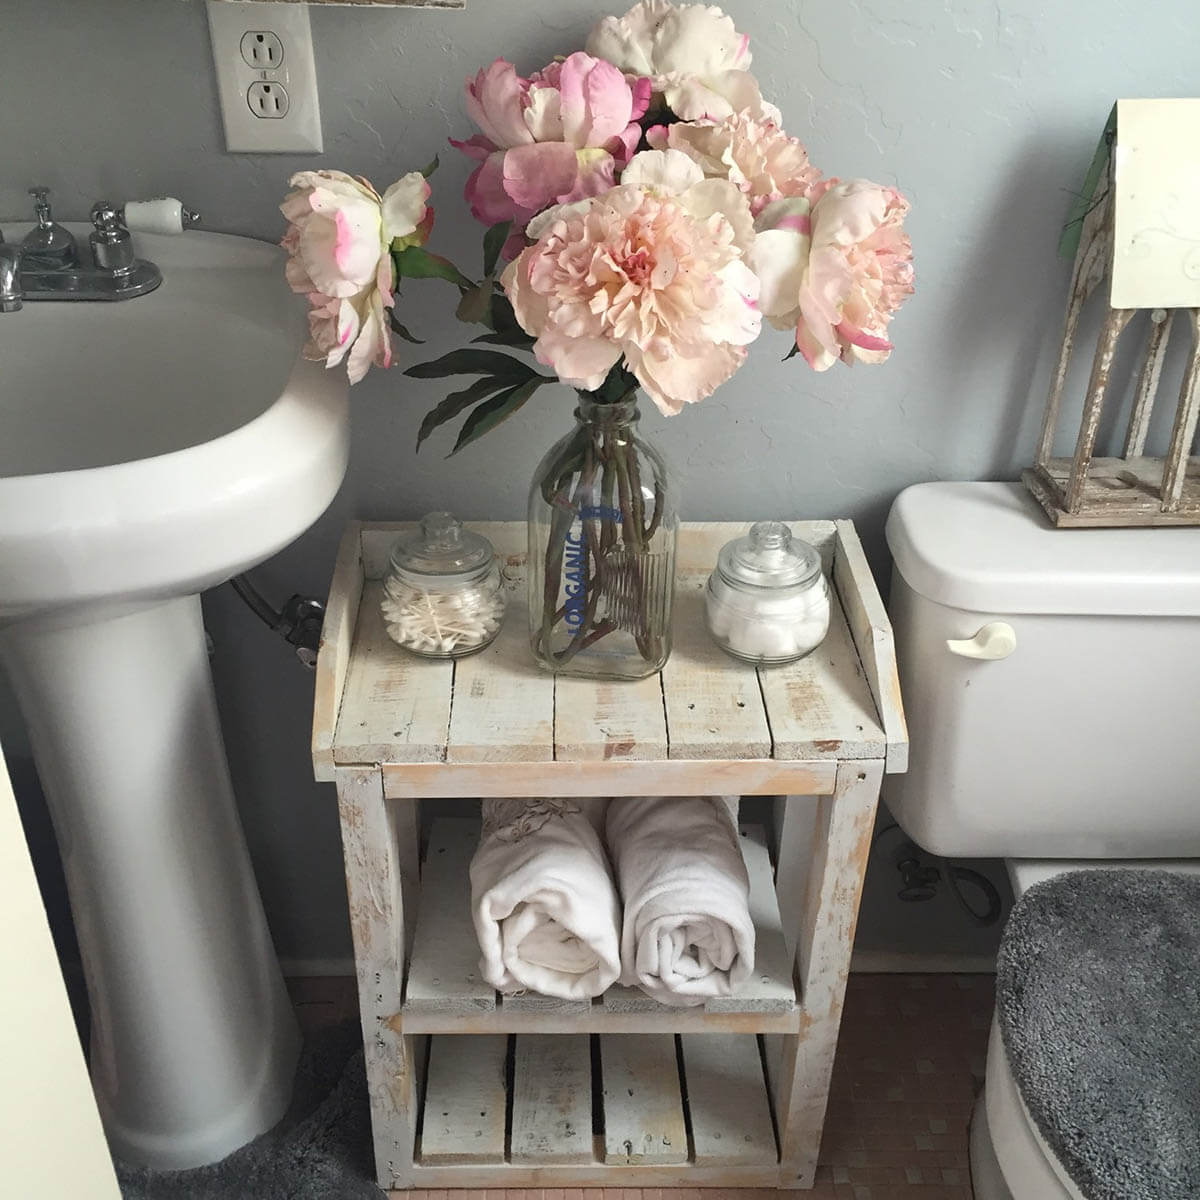 Fullsize Of Shabby Chic Bathroom Shelf